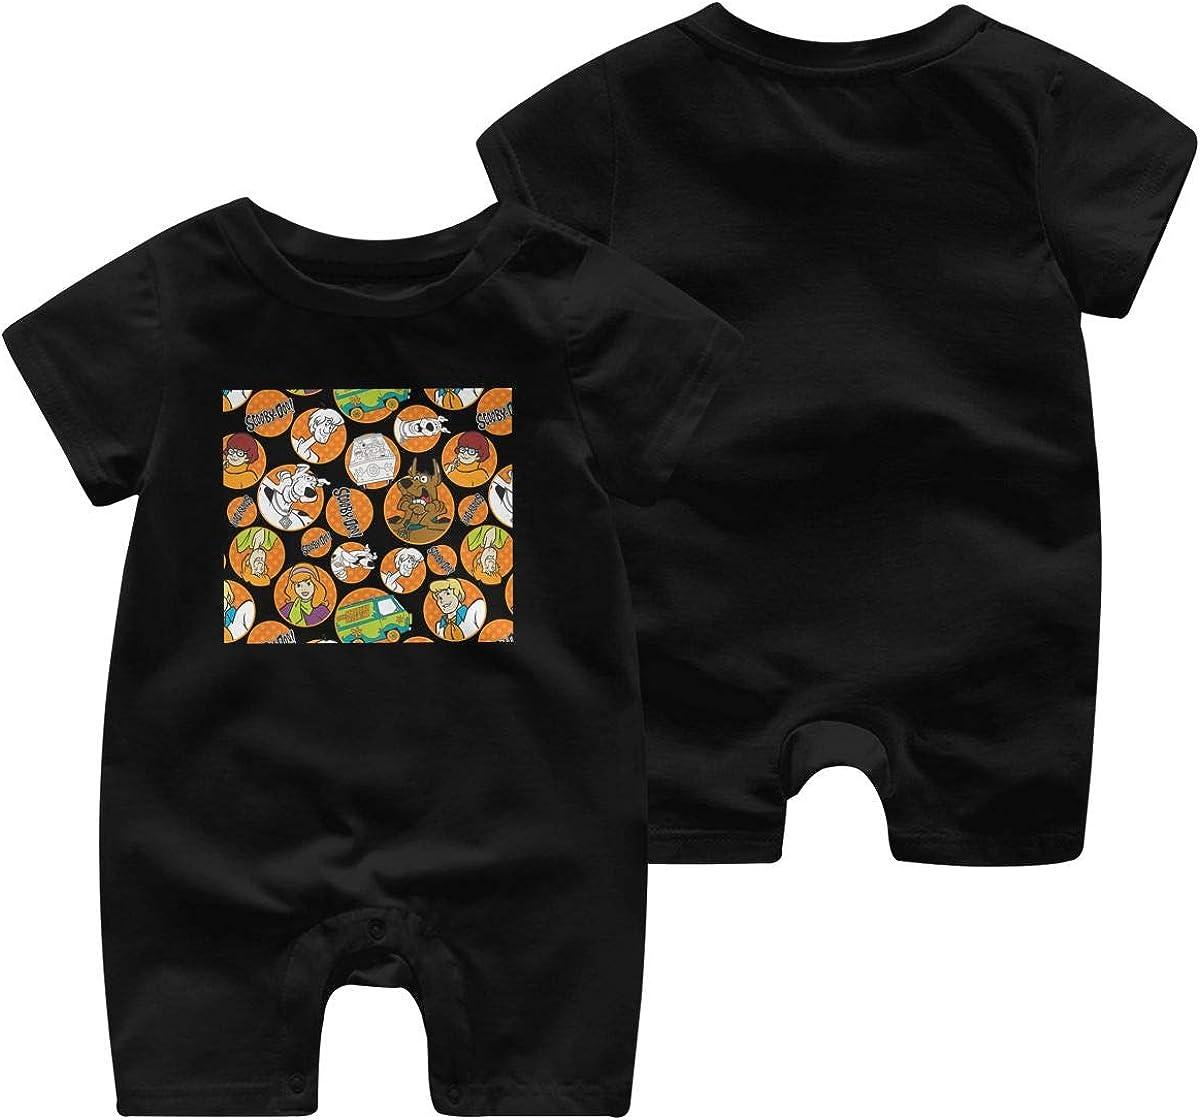 Scooby Doo Newborn Cotton Long Sleeve Onesies for Baby Boys /& Girls